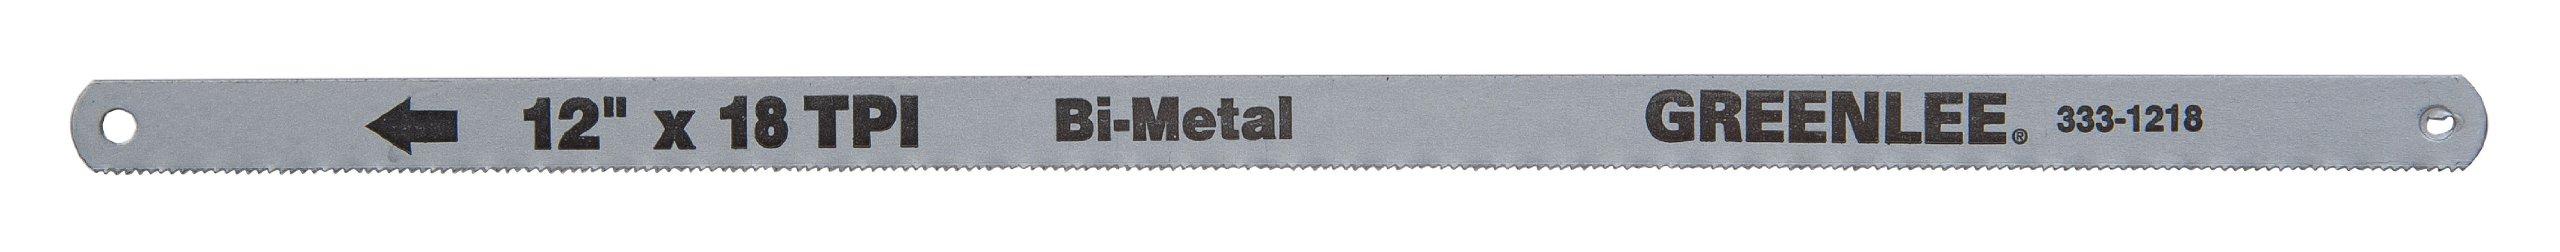 Greenlee 333-1218 Bi-Metal Hacksaw Blade, 12-Inch, 18-TPI, 5-Pack